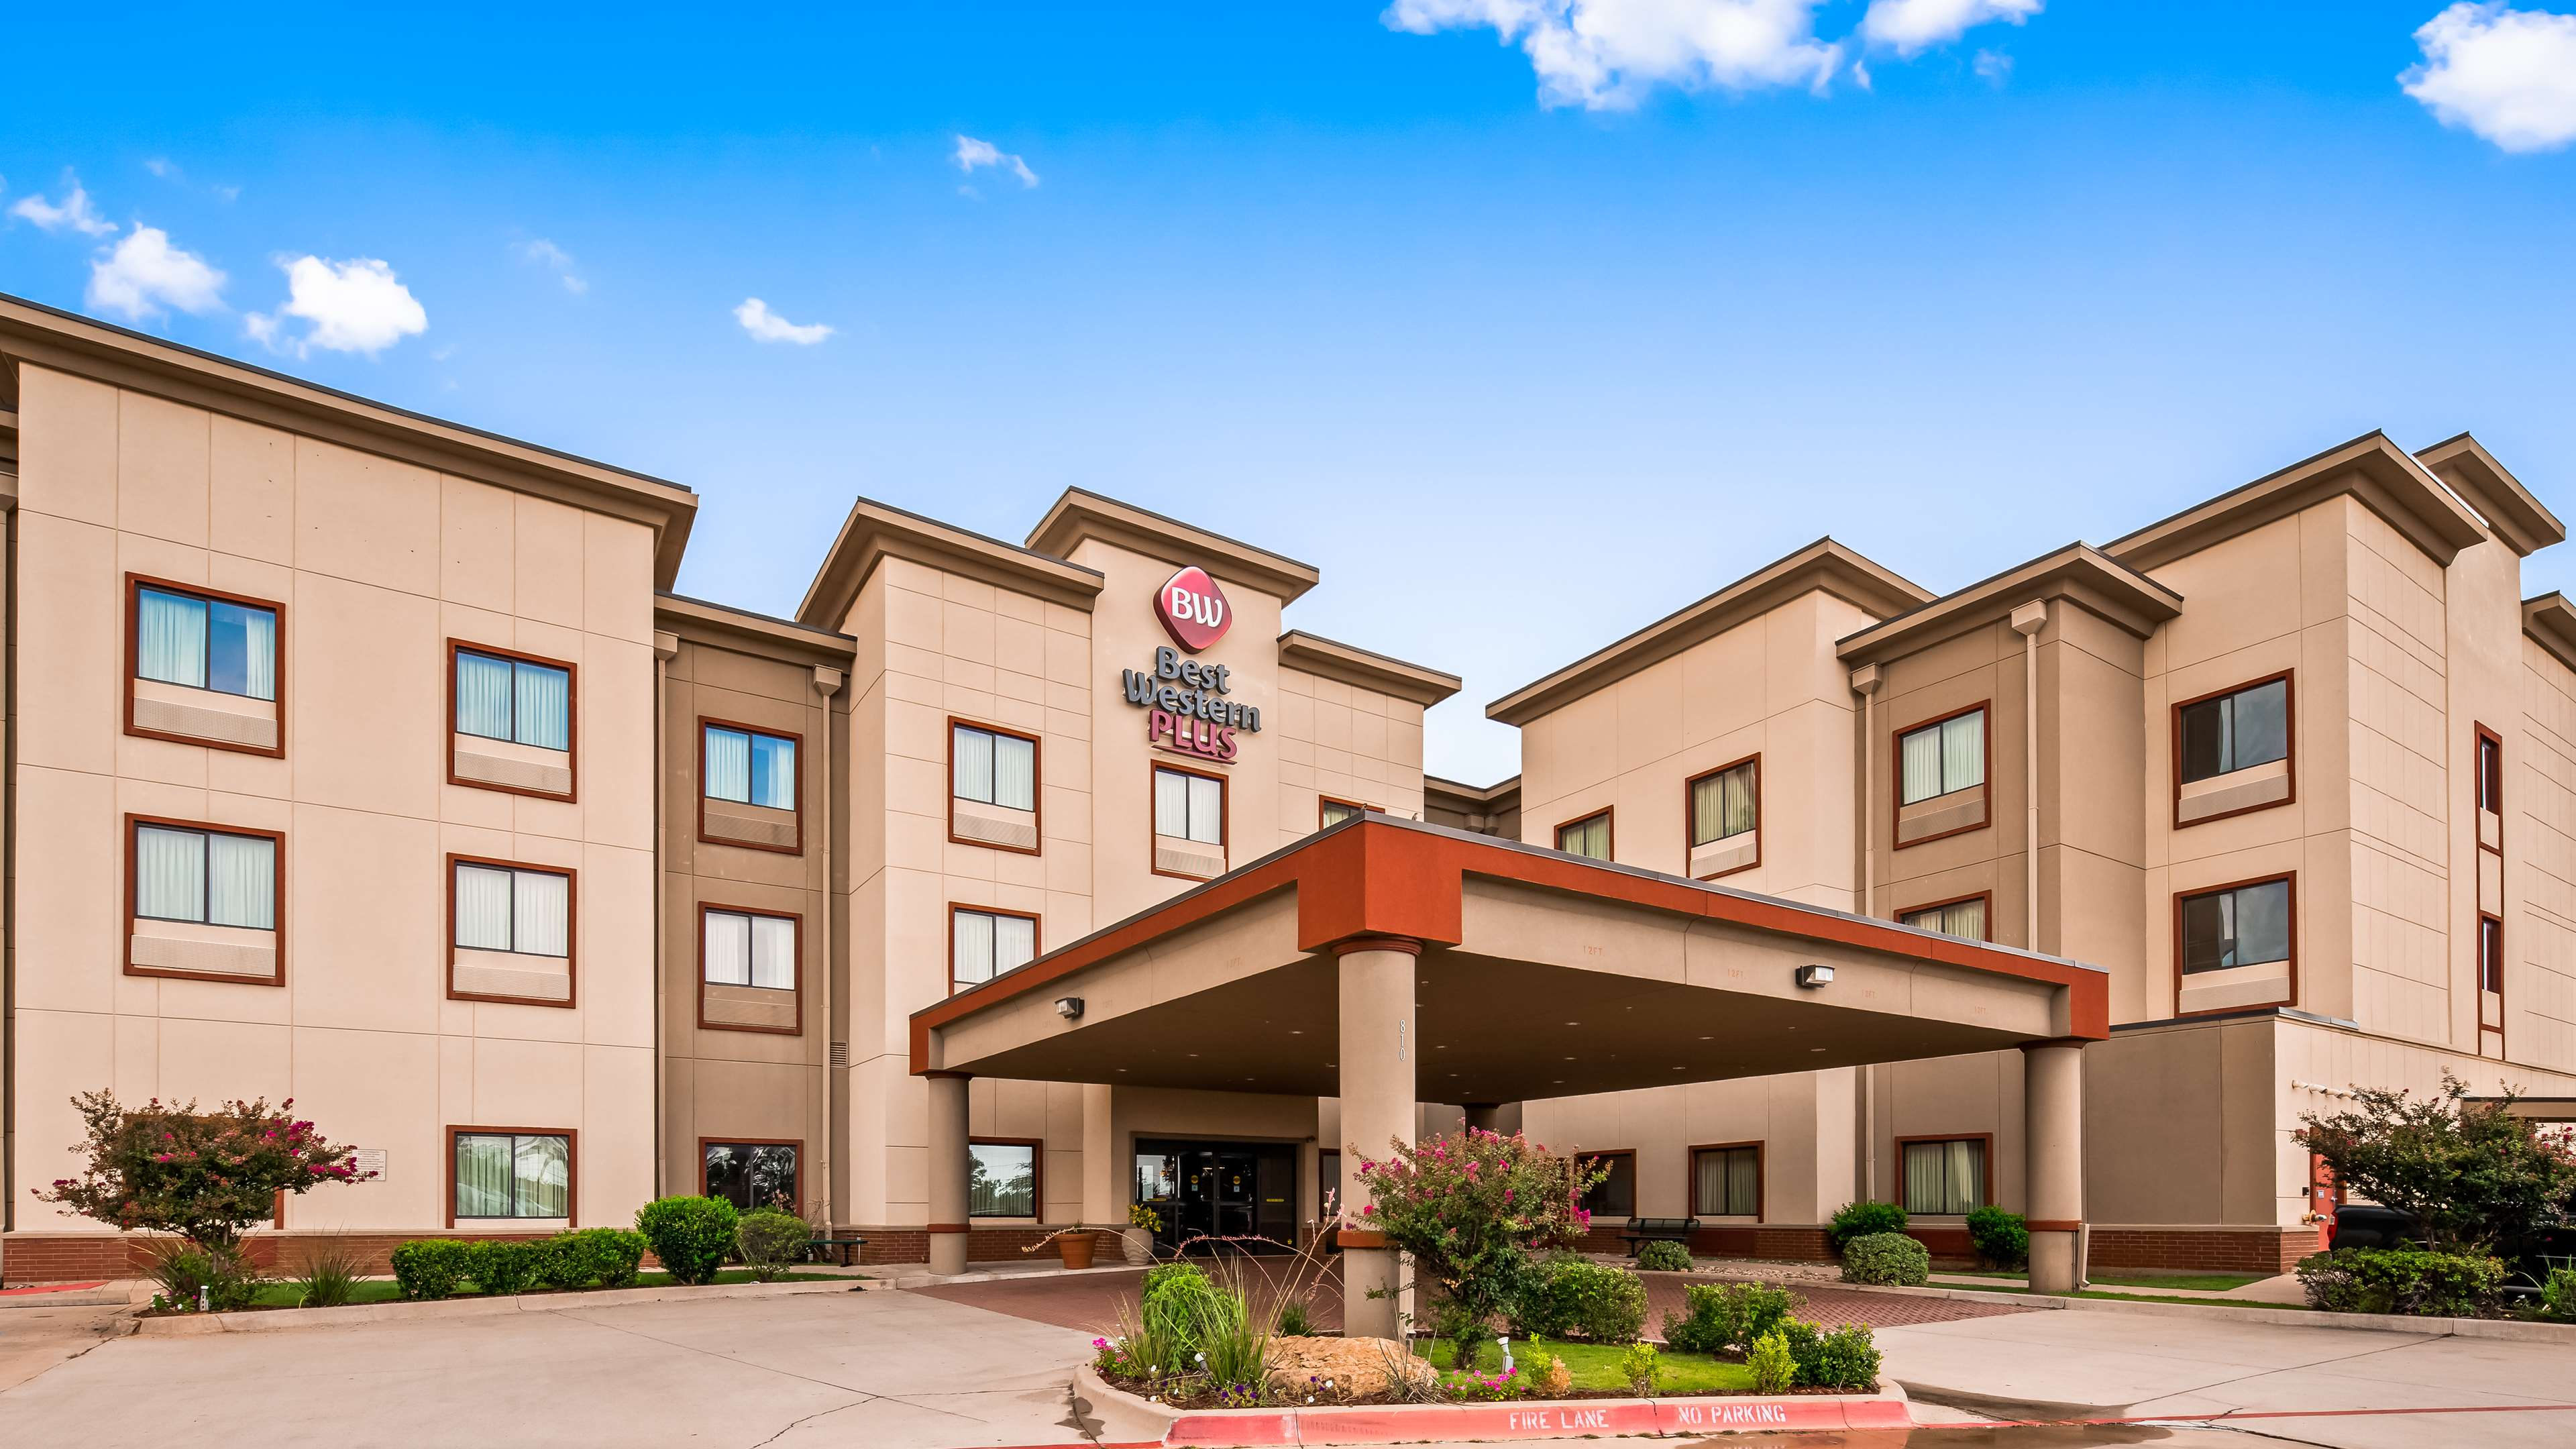 Best Western Plus Texoma Hotel & Suites image 2